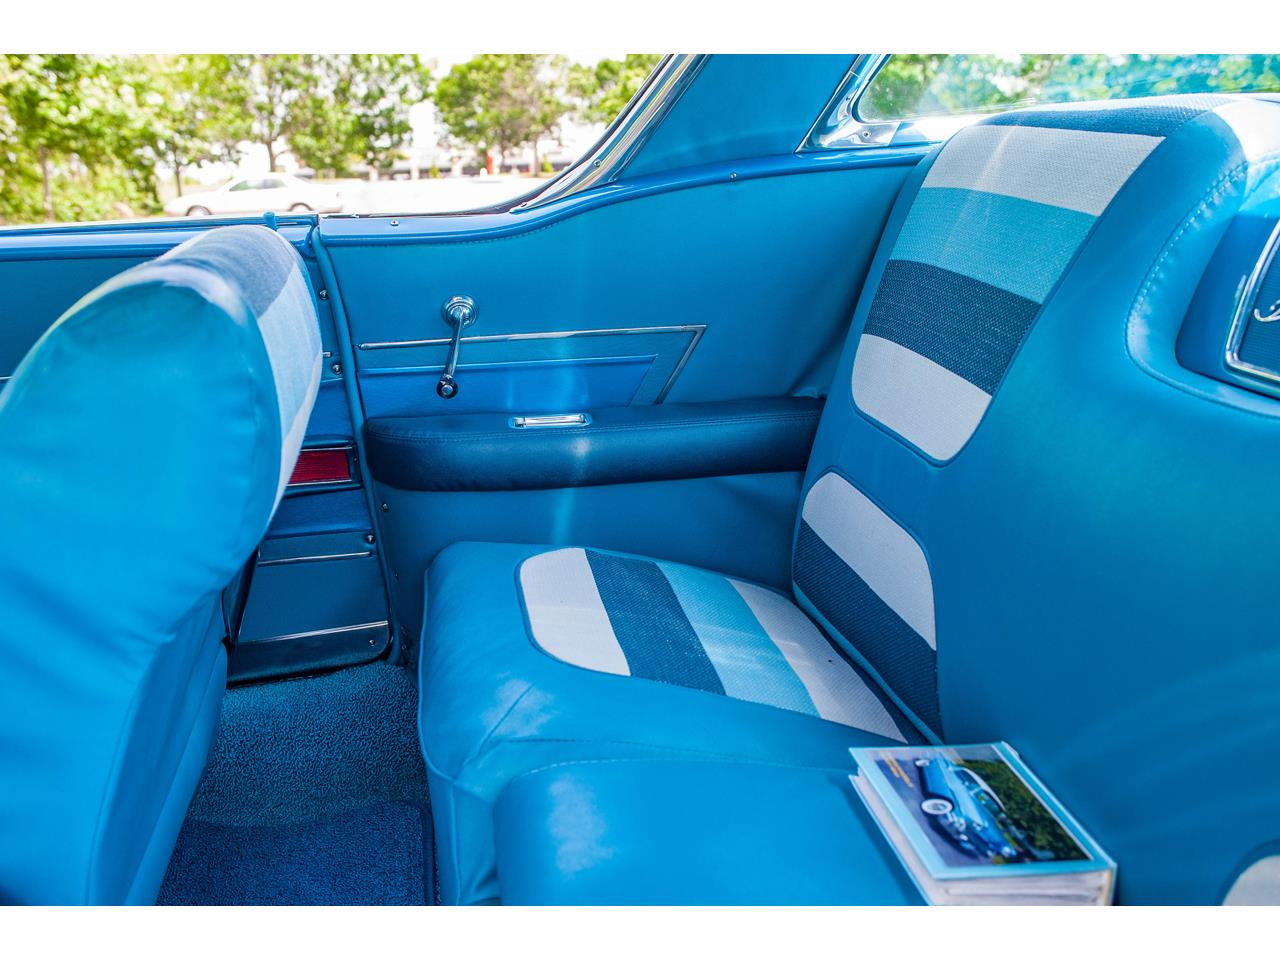 Large Picture of Classic 1958 Chevrolet Impala located in Illinois - $62,000.00 - QB9Q